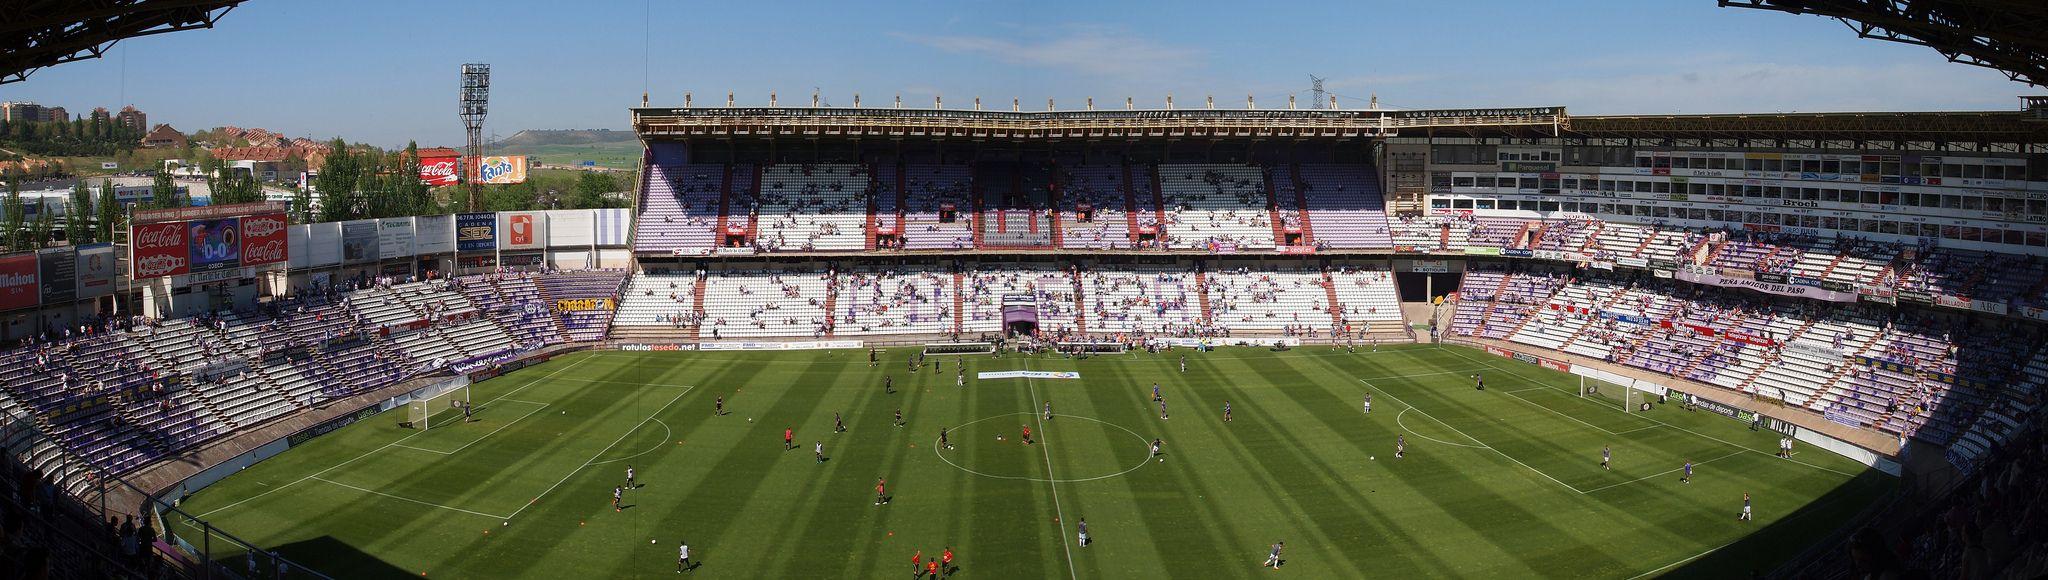 Real Valladolid Vs Real Madrid At Estadio Nuevo Jose Zorrilla On 26